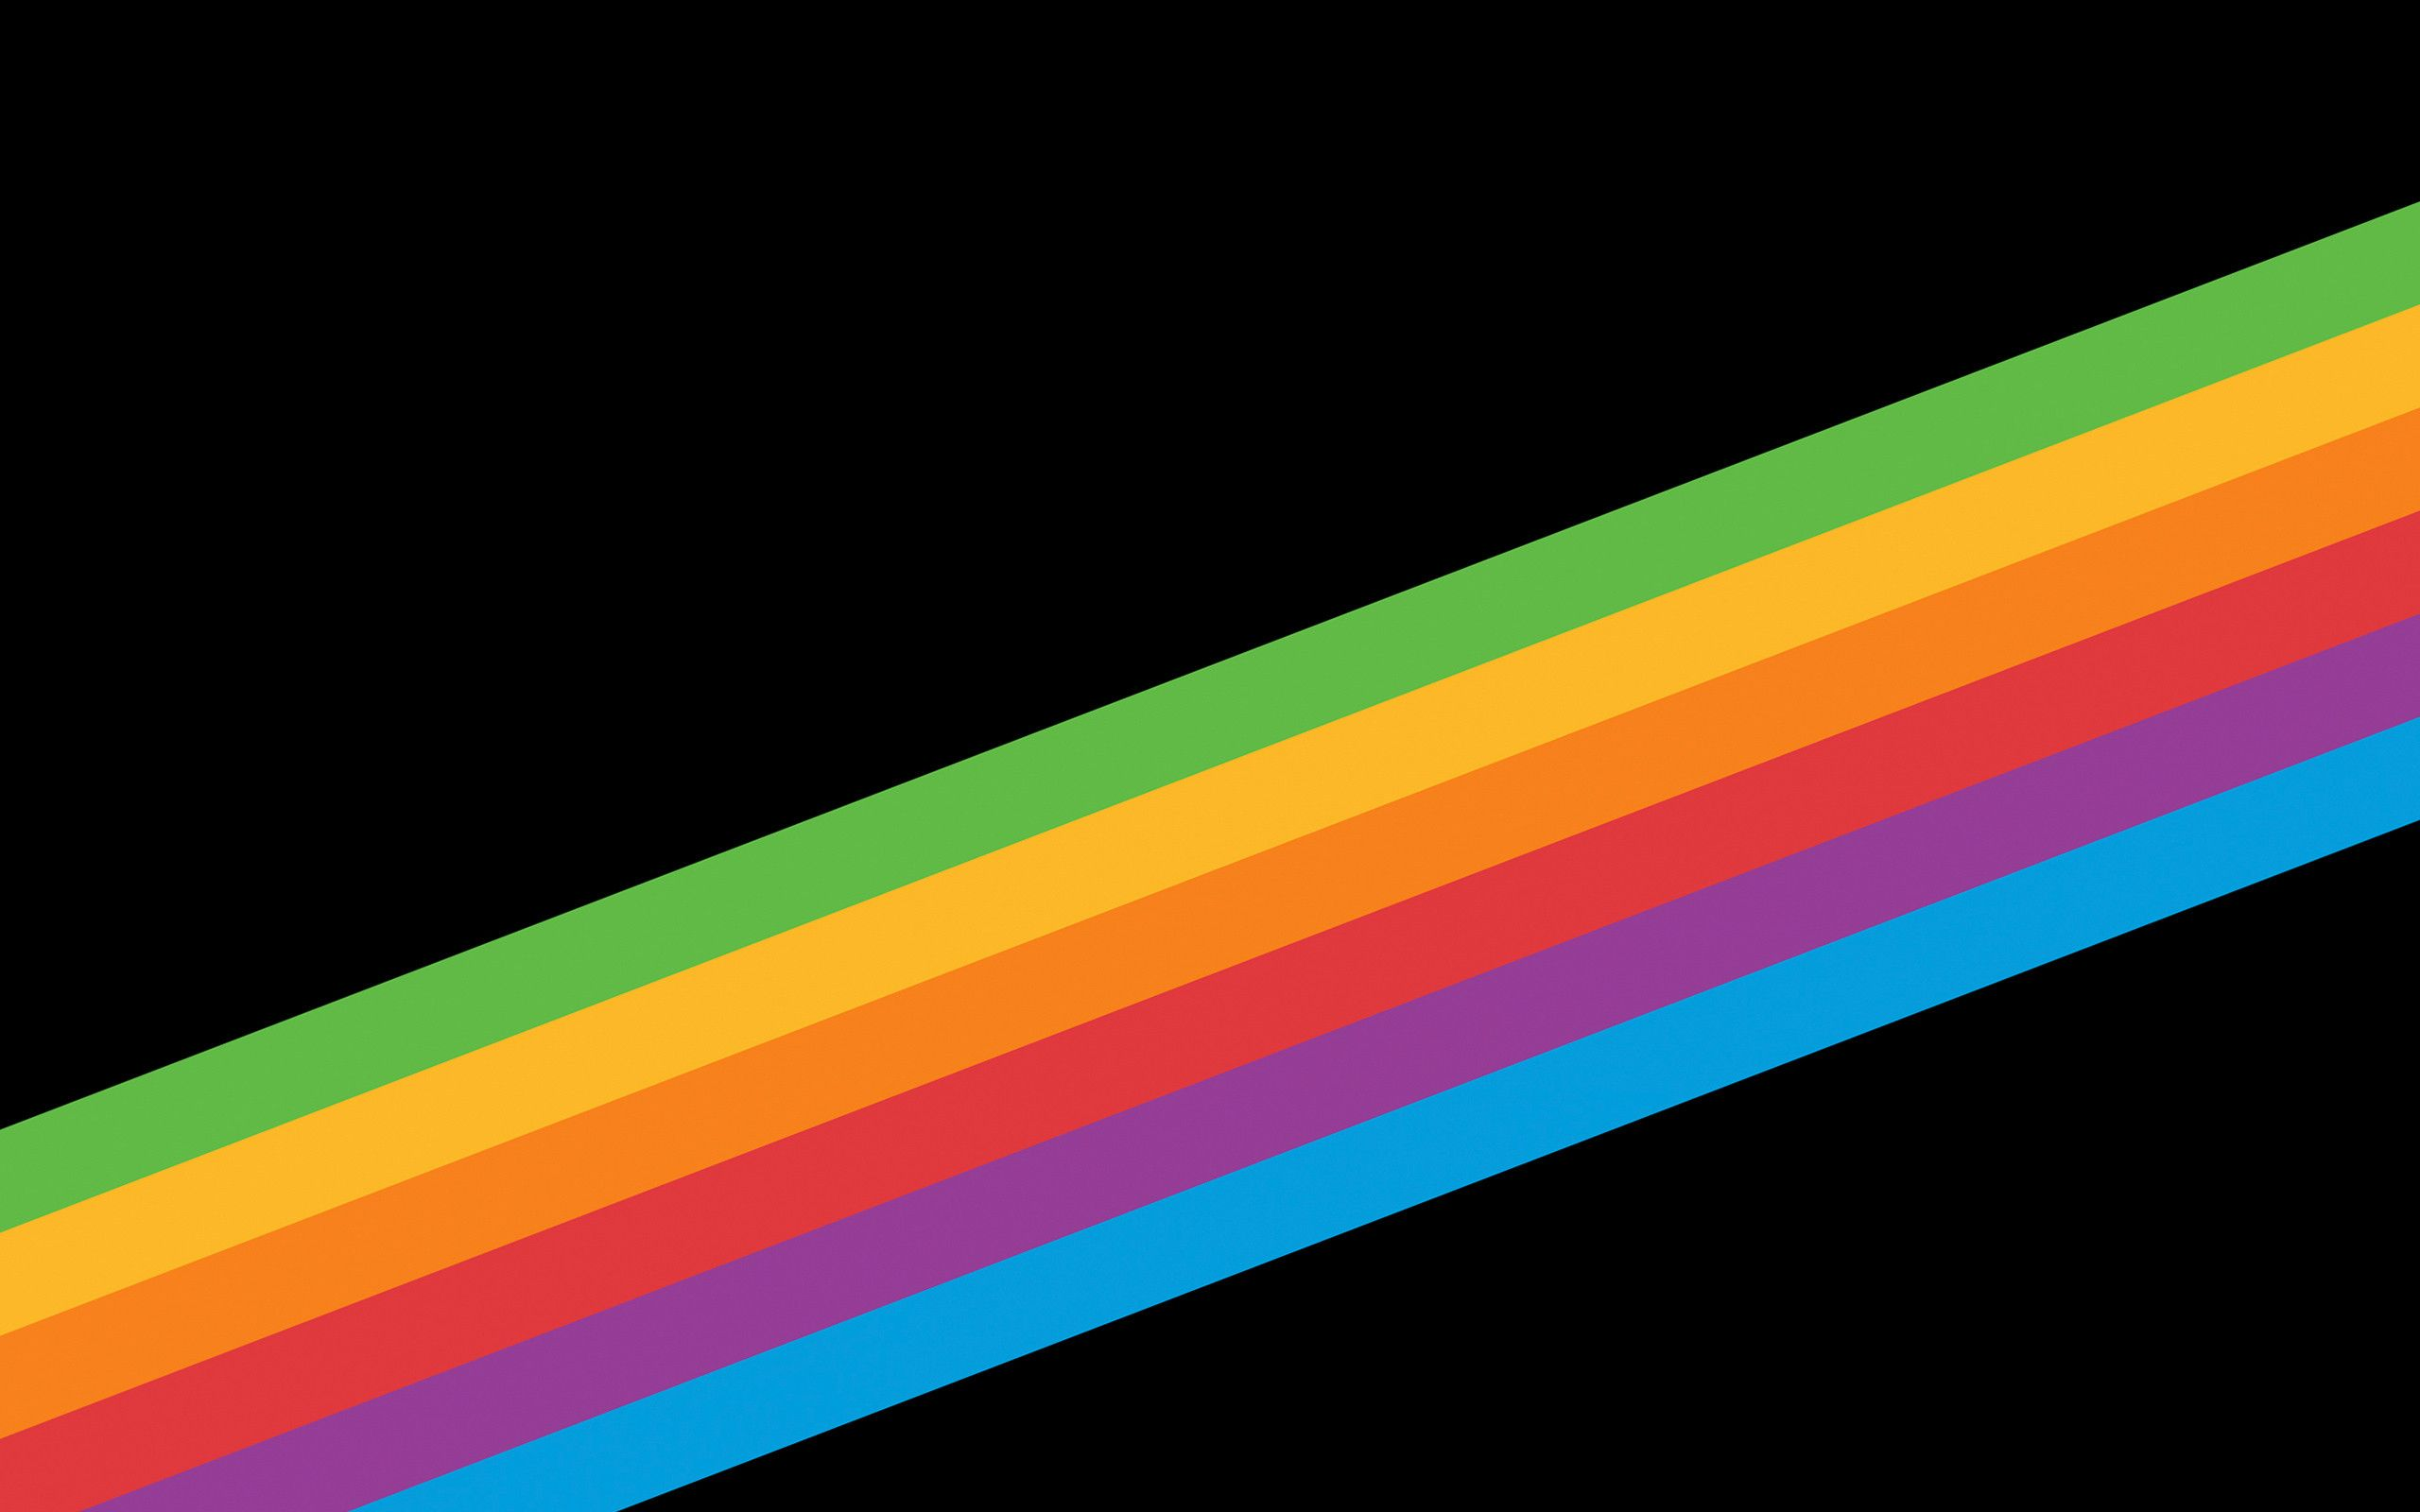 Aesthetic Rainbow Wallpapers Top Free Aesthetic Rainbow